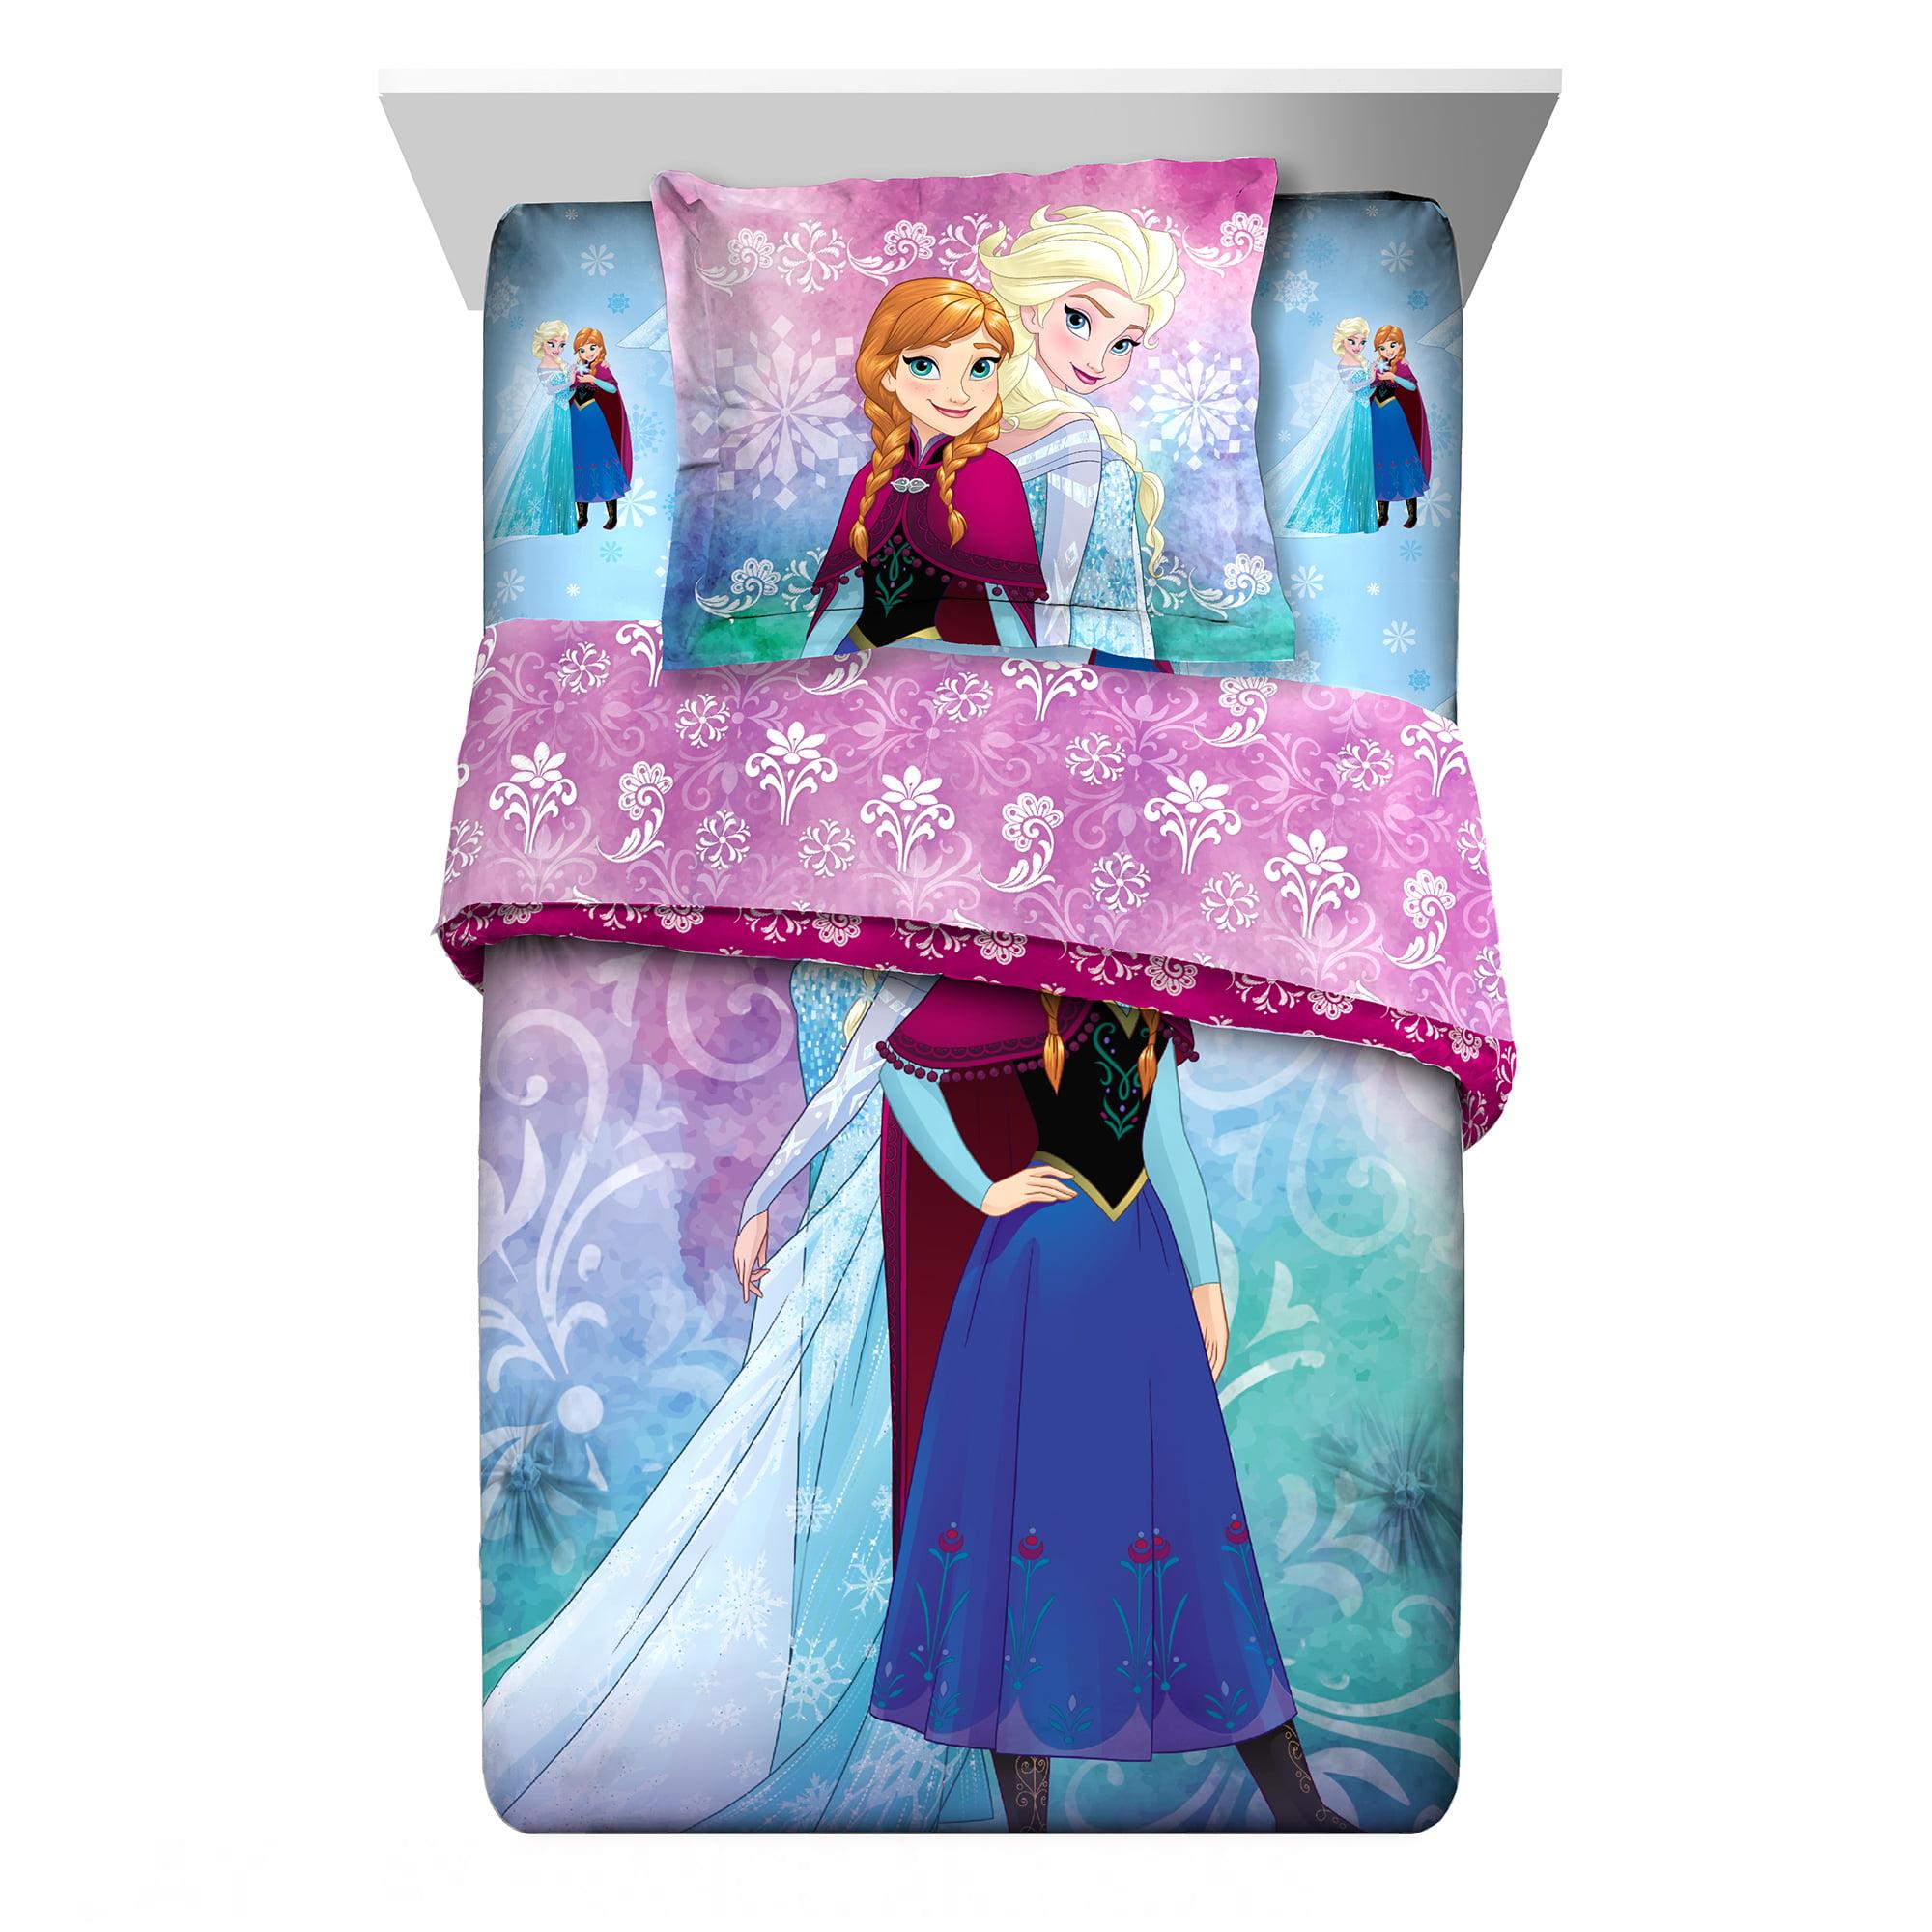 Disney Frozen Nordic Frost Comforter Set with Sham, 2 Piece